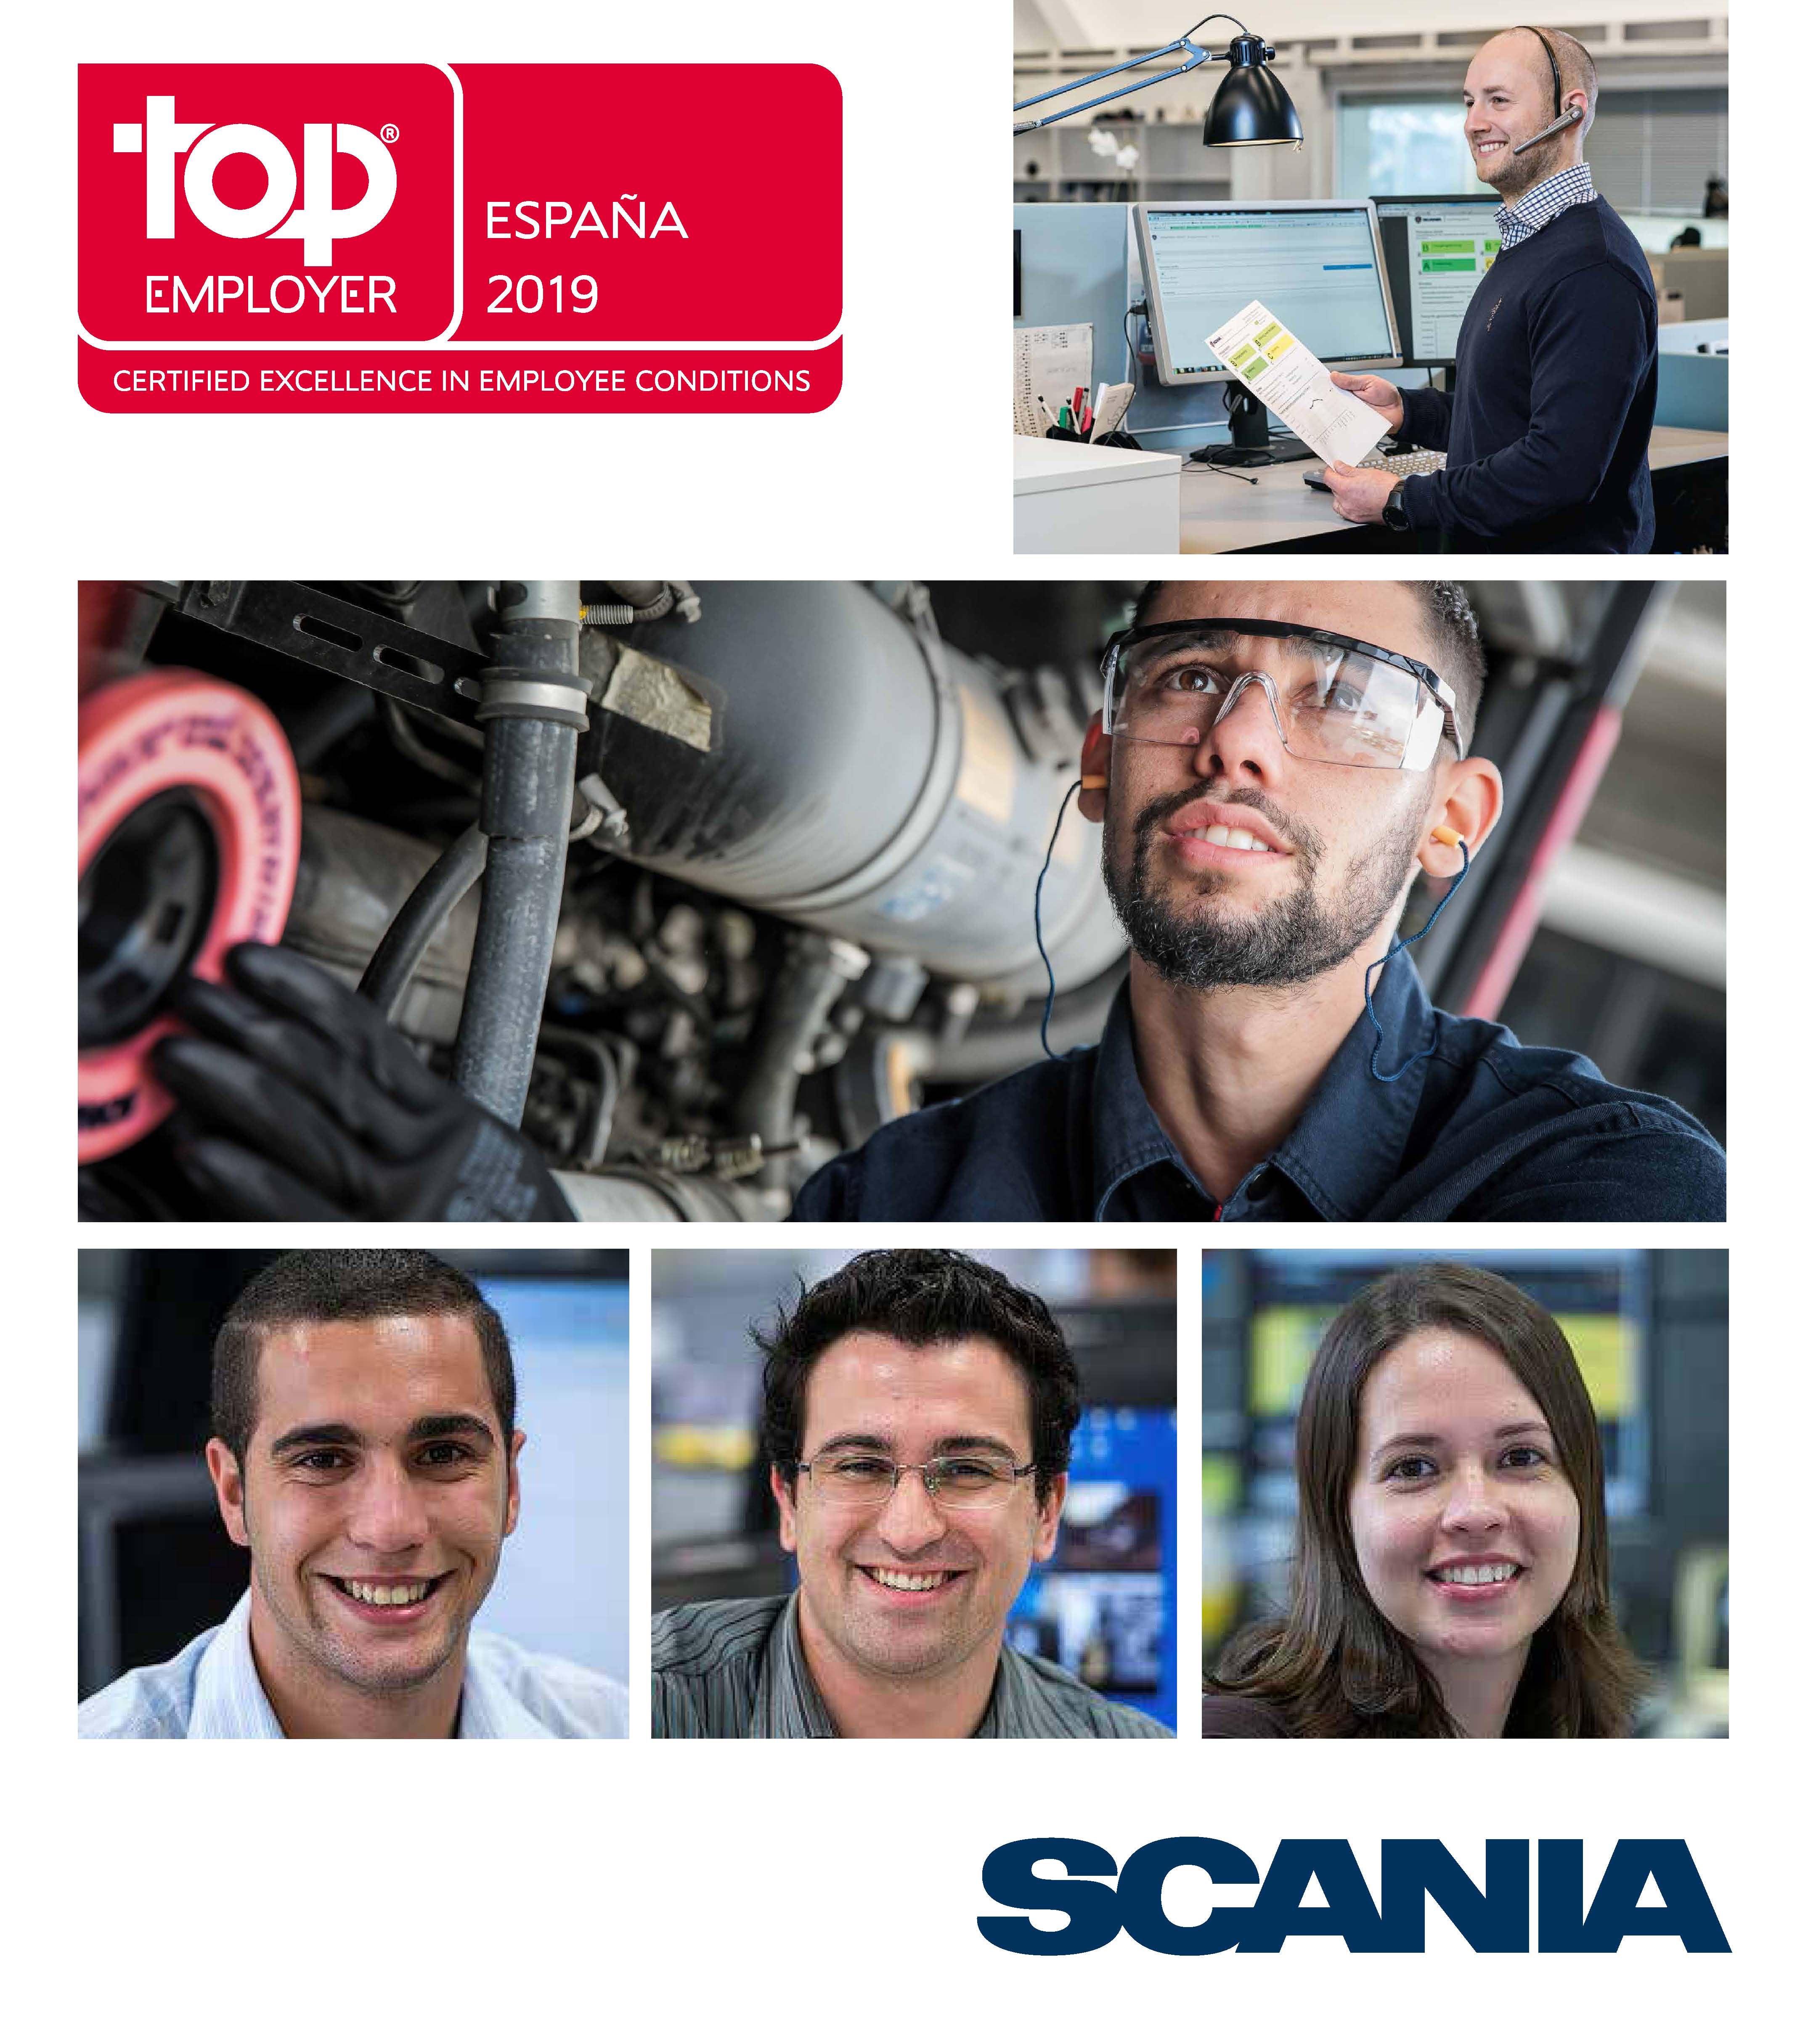 Scania reconocida por cuarto año como empresa Top Employer